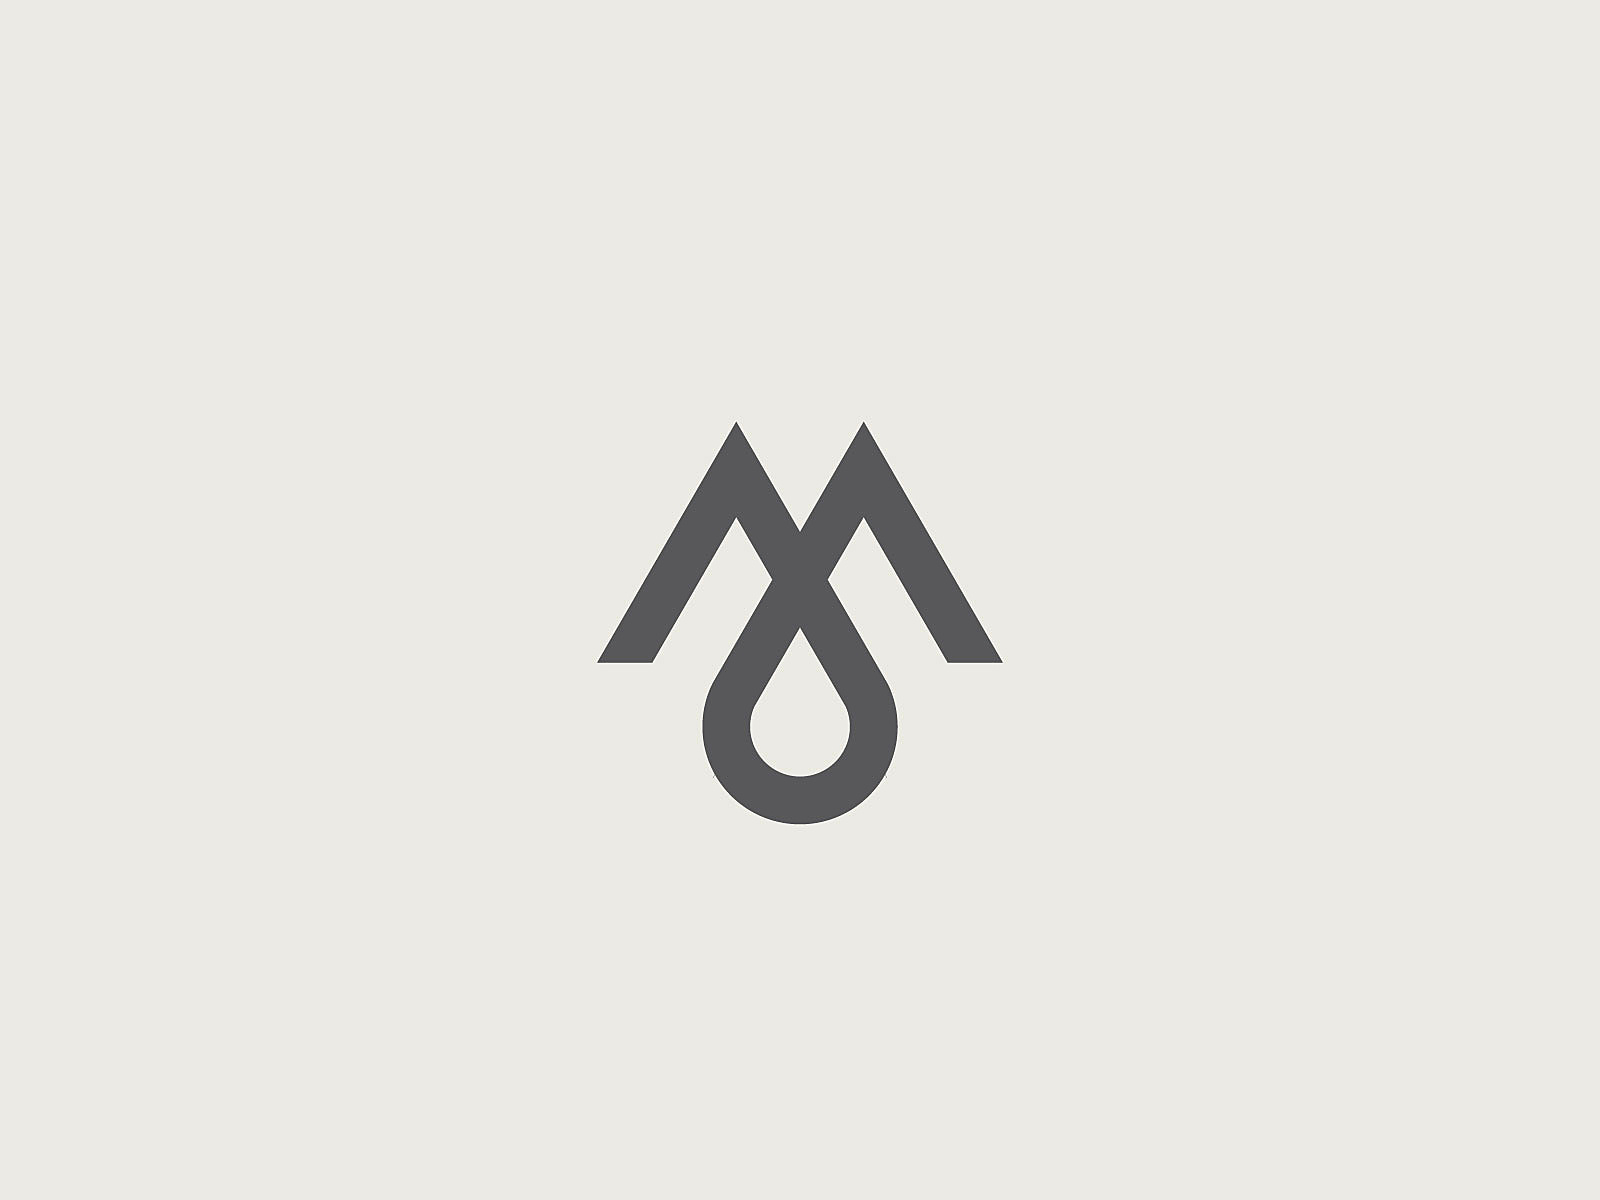 M Letter Mark Logo Design by MONCEF ARAJDAL on Dribbble.